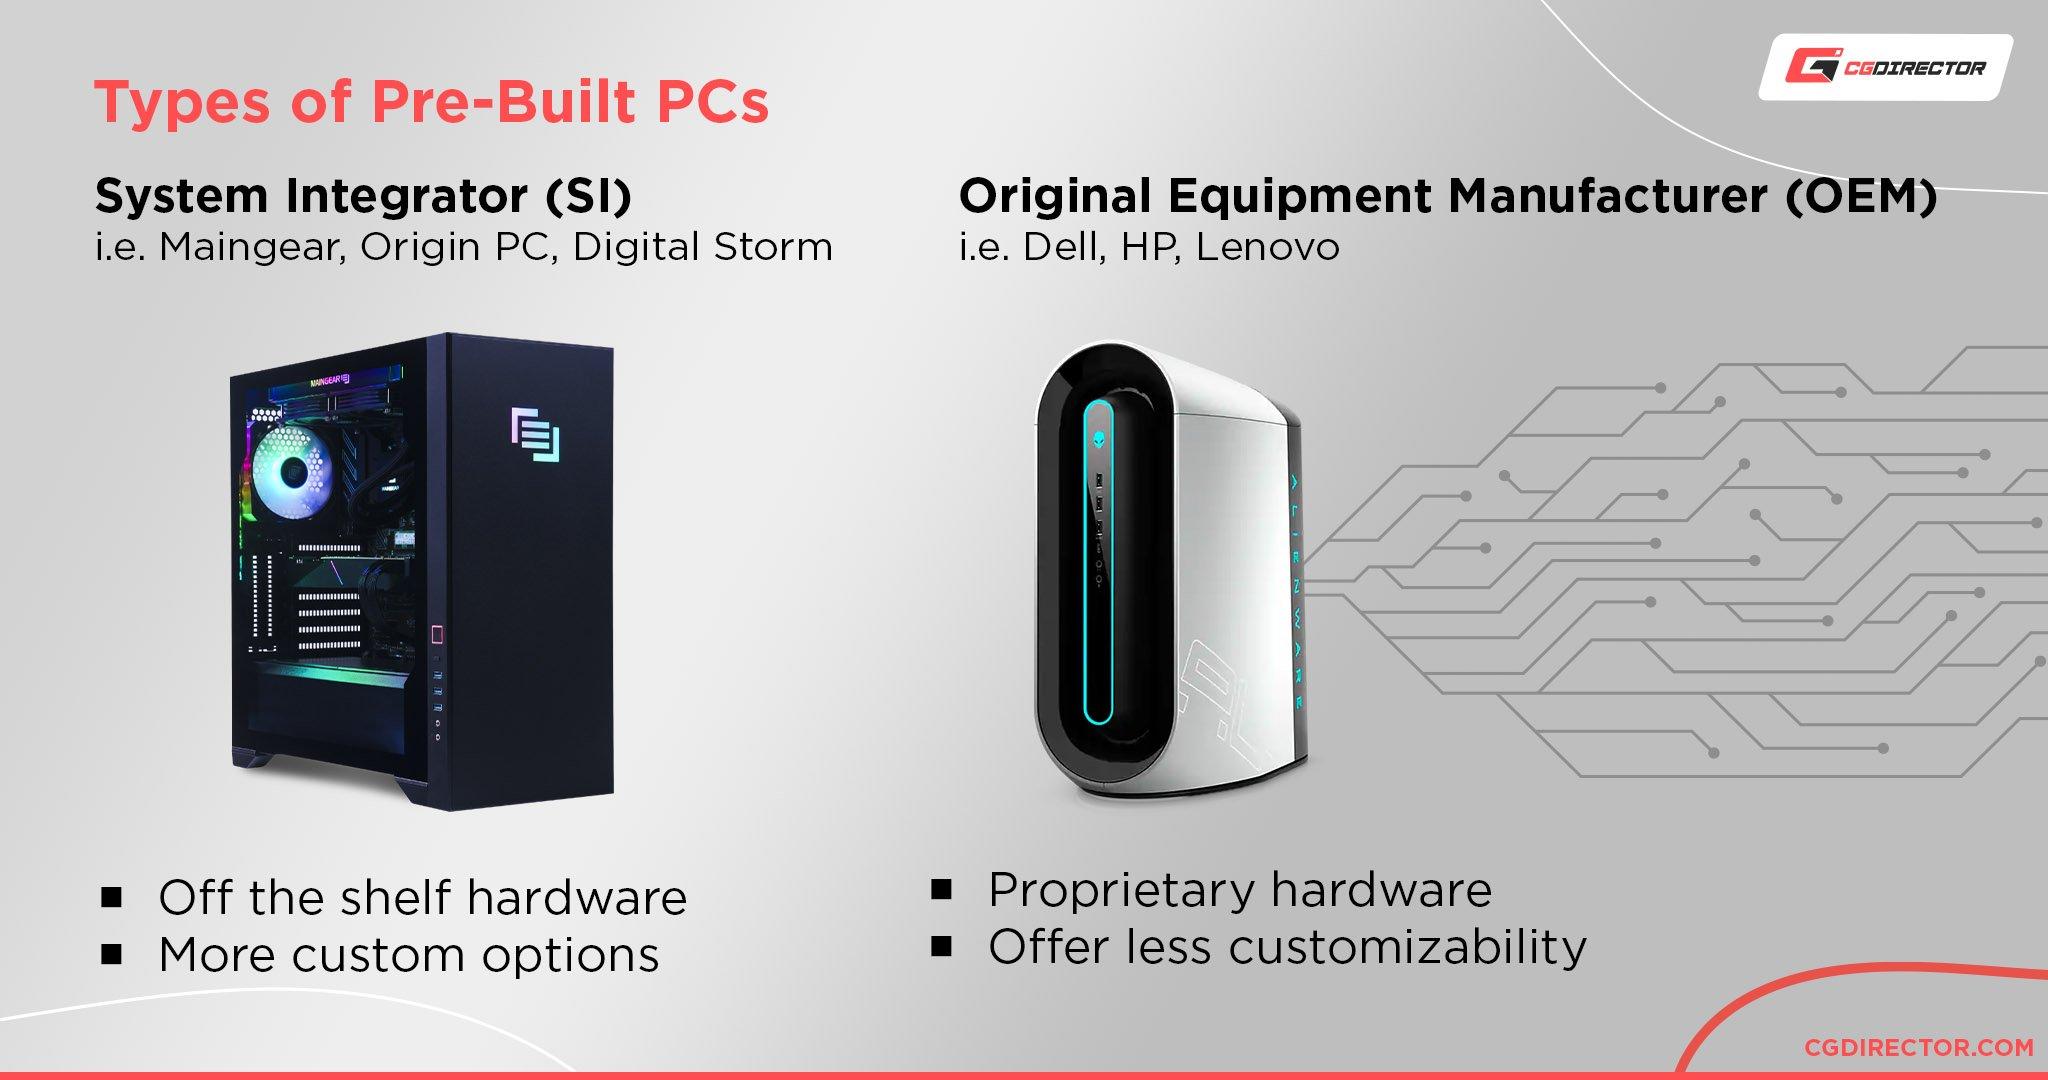 Types of Pre-Built PCs